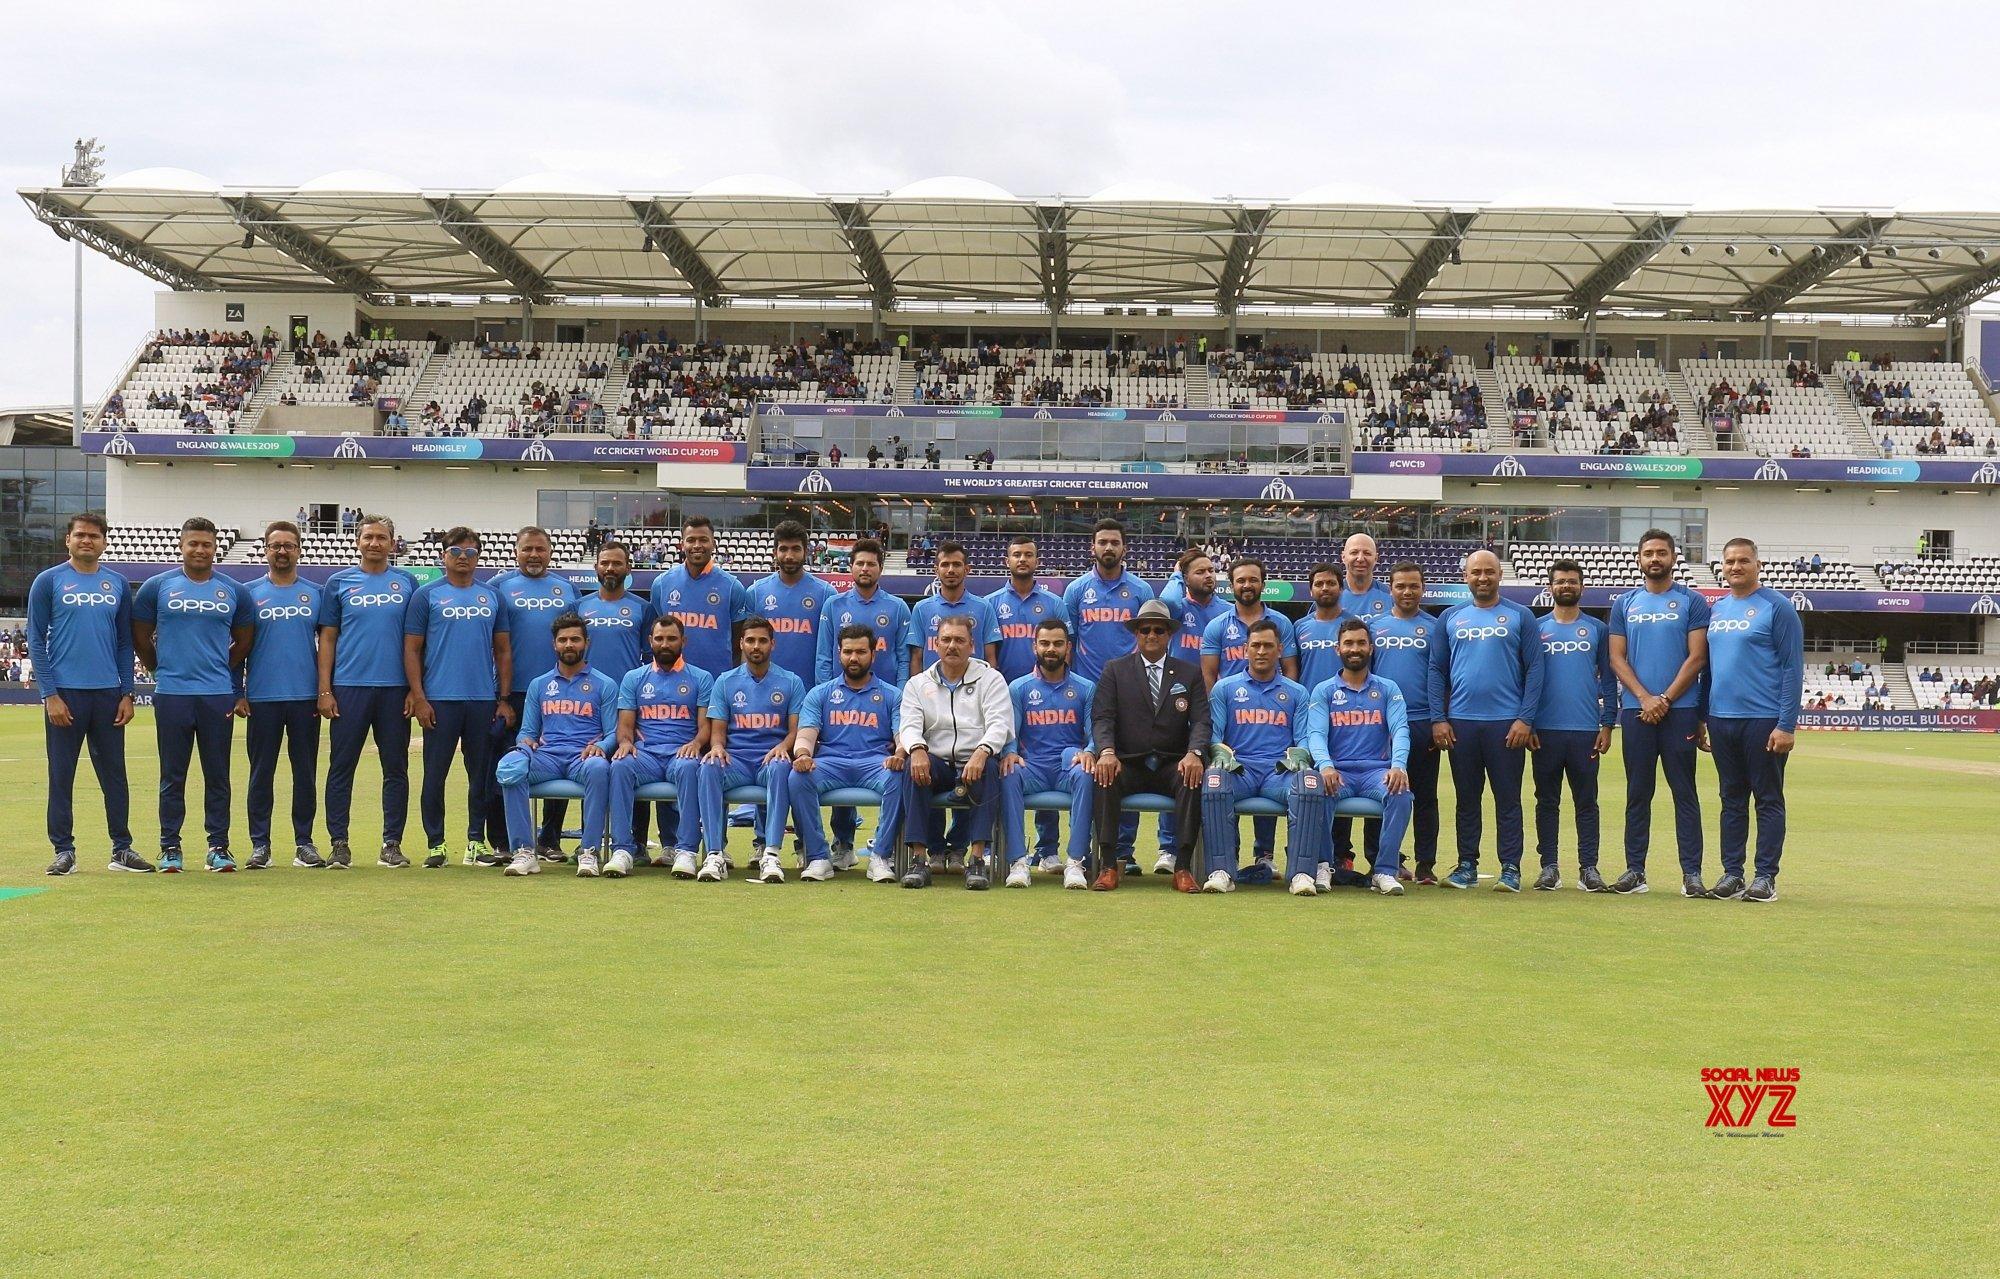 Leeds (England): World Cup 2019 - India Vs Sri Lanka (Batch - 4) #Gallery